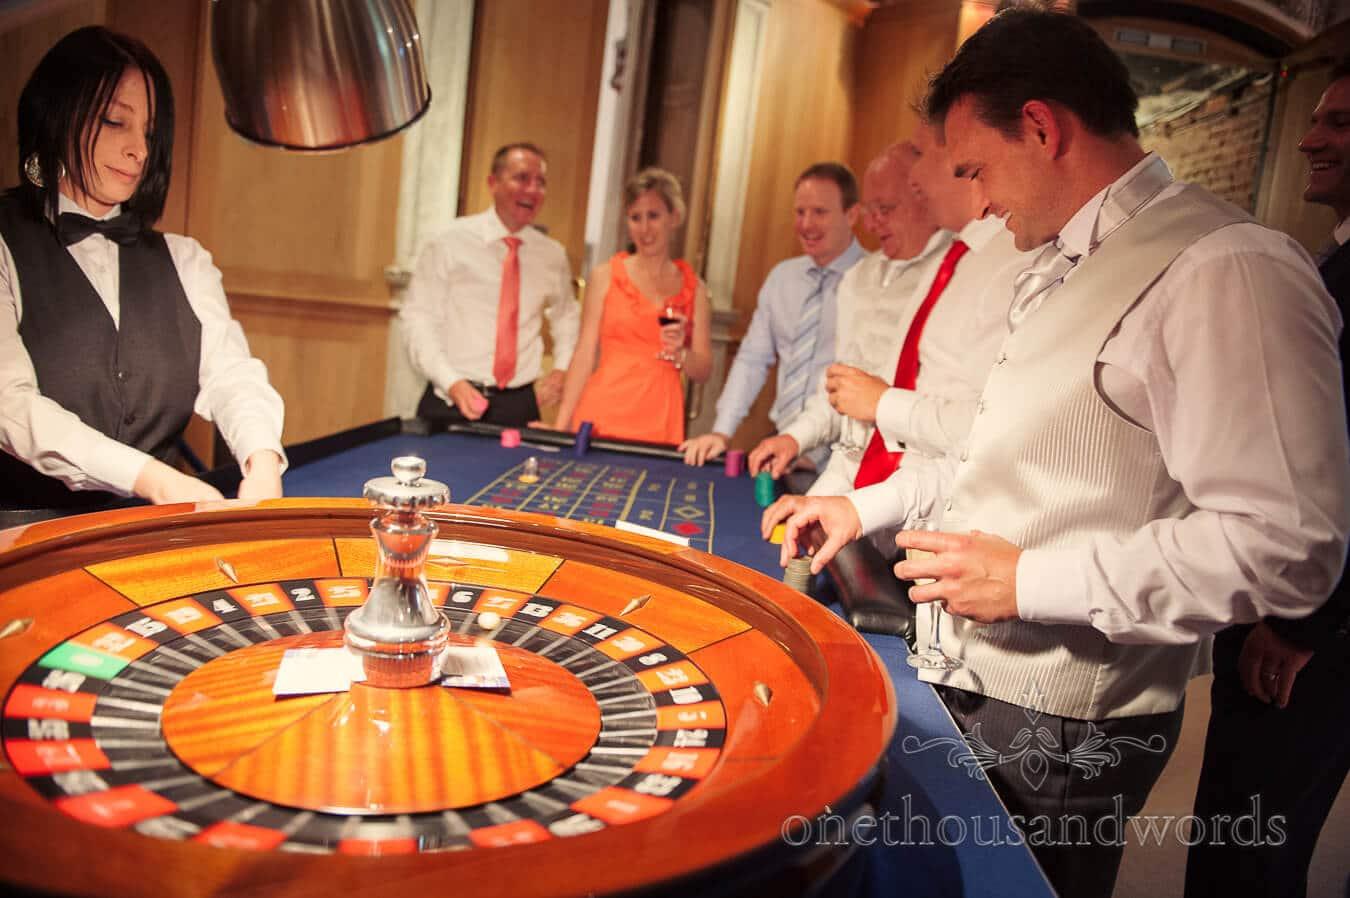 Wedding Casino at Highcliffe Castle Wedding venue